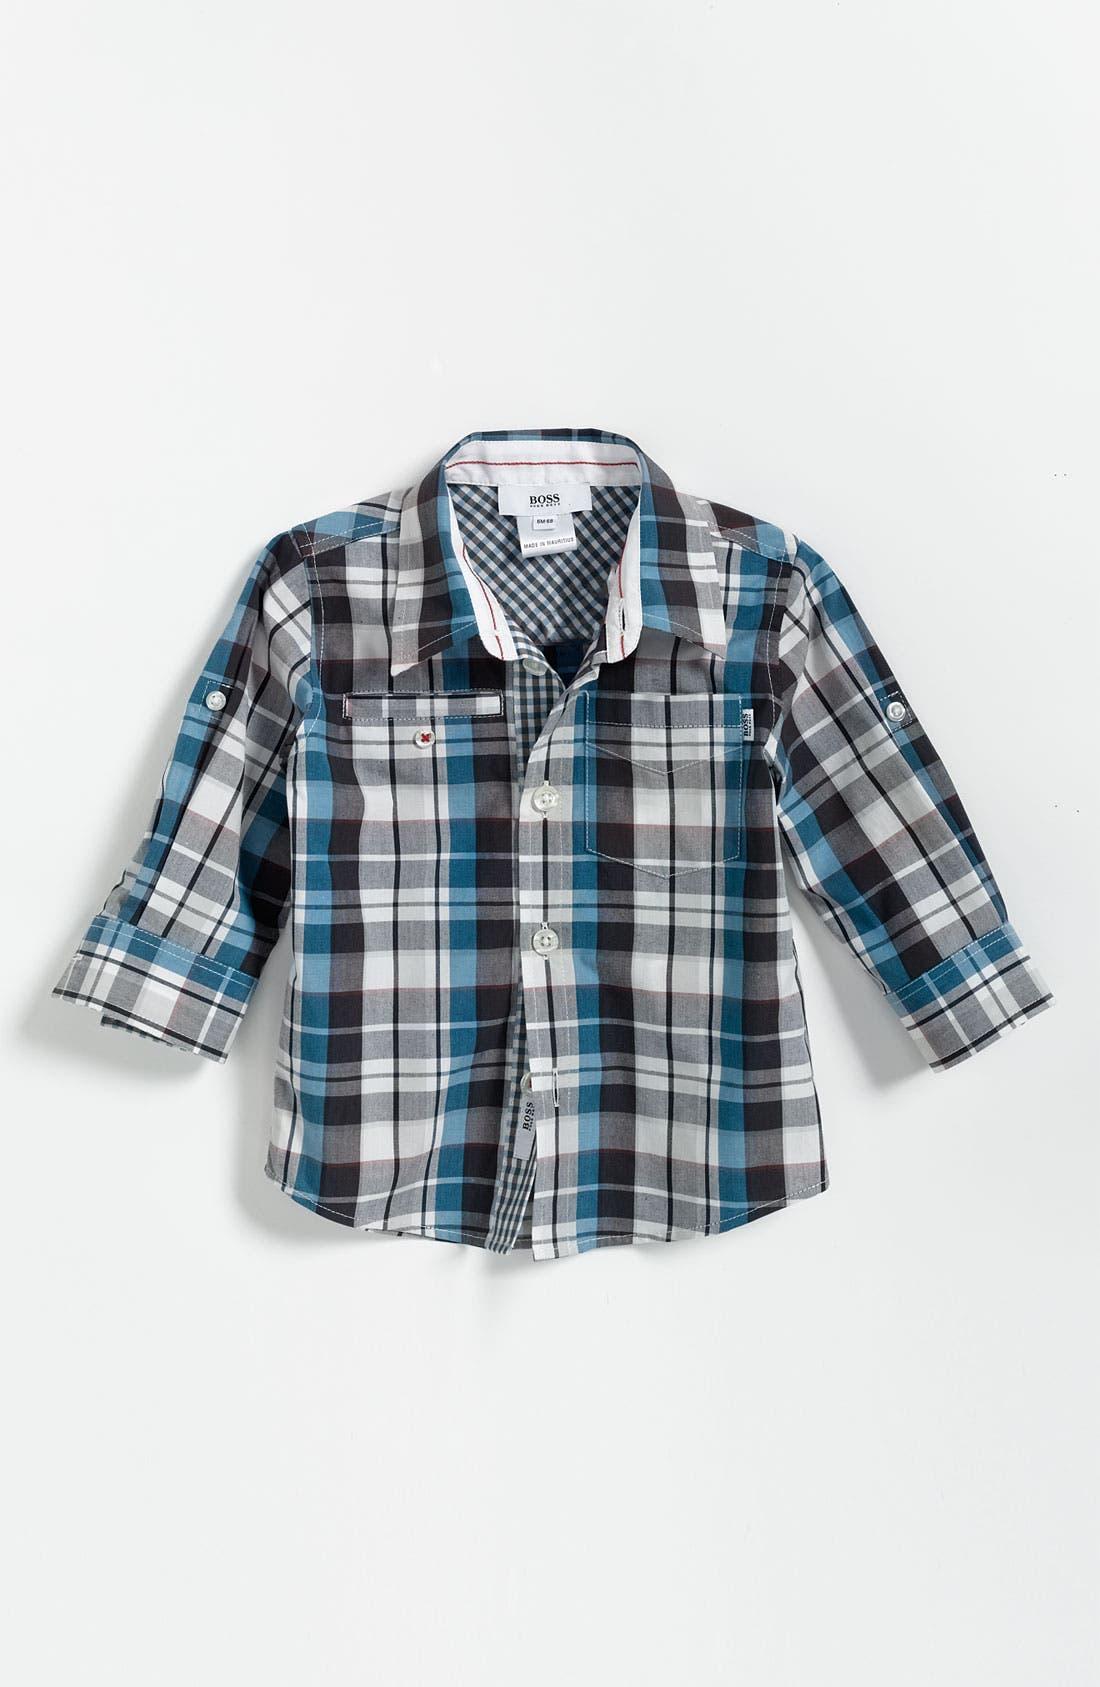 Main Image - BOSS Kidswear Check Print Shirt (Infant)